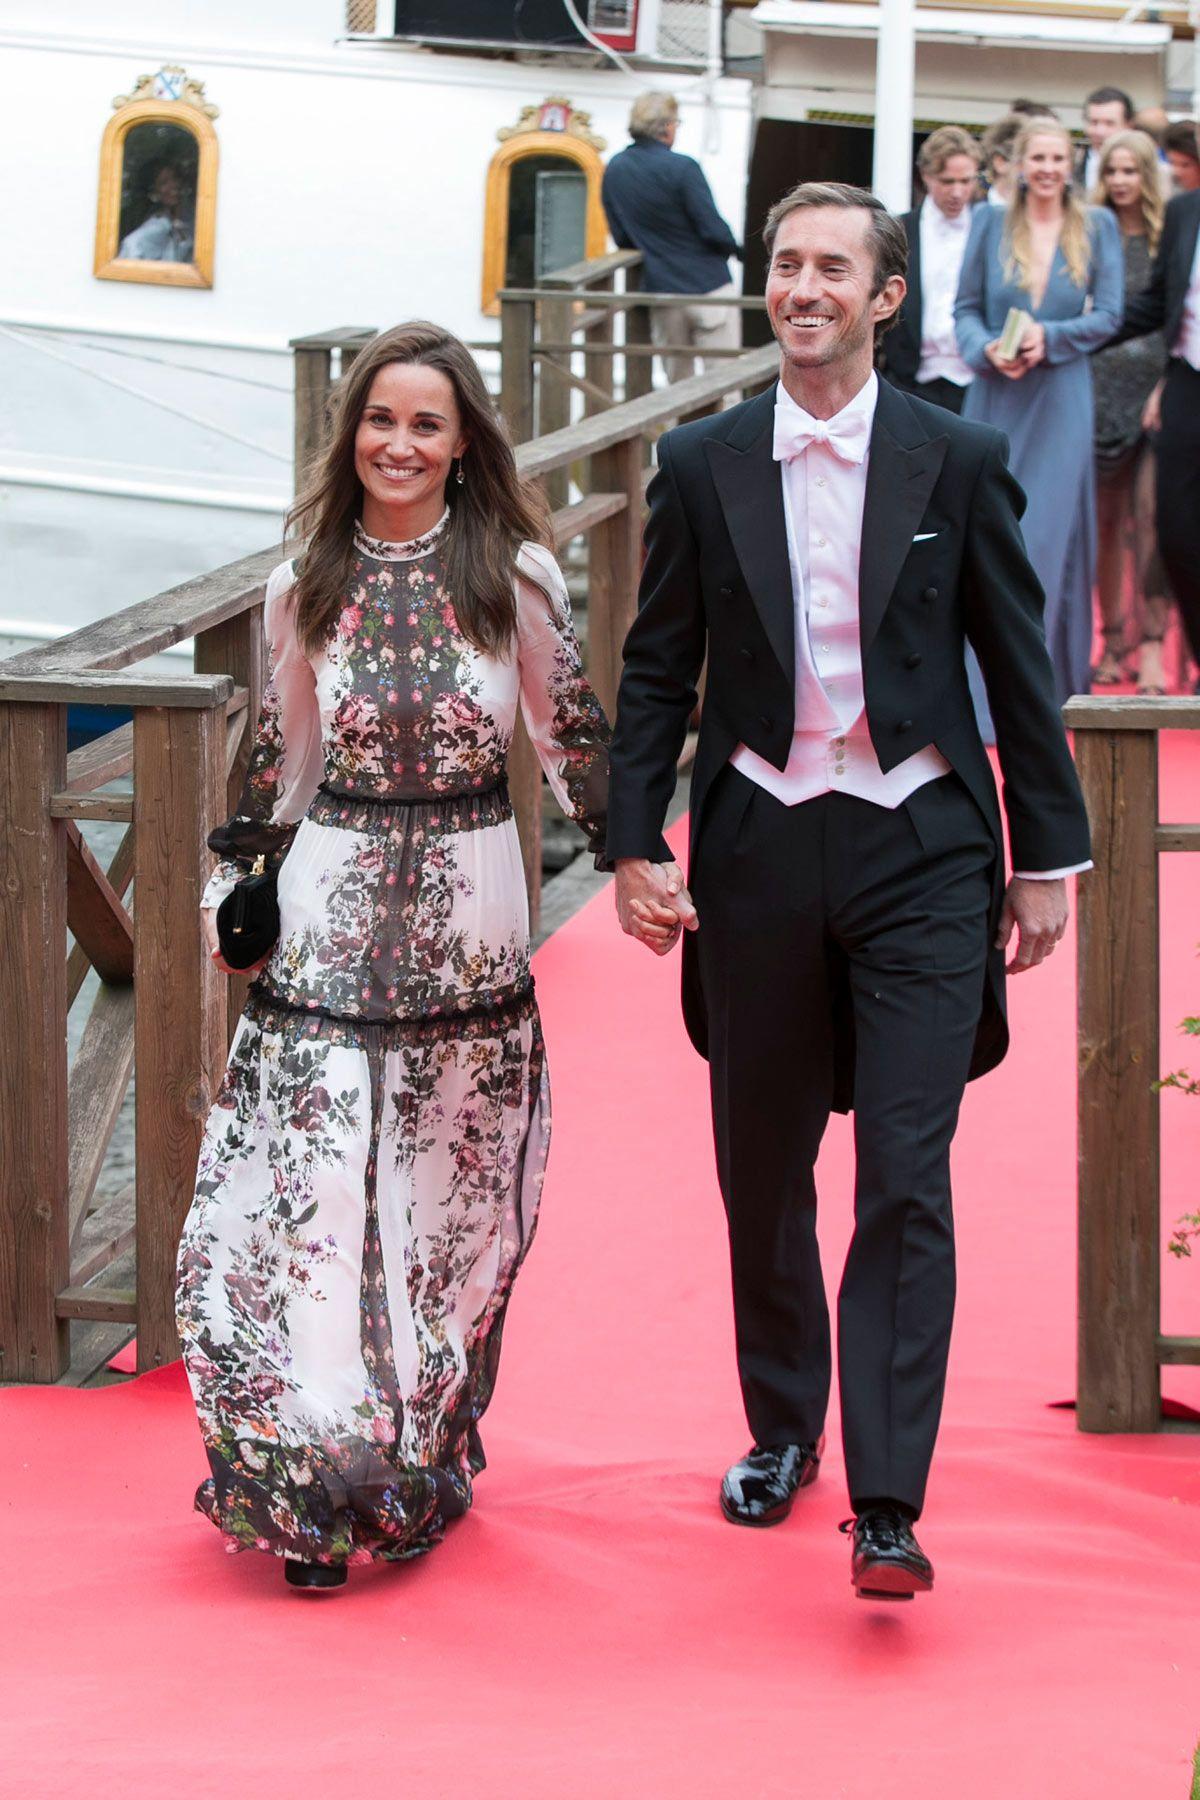 Famoso Vestido De La Dama De Honor Estilo Pippa Middleton Componente ...